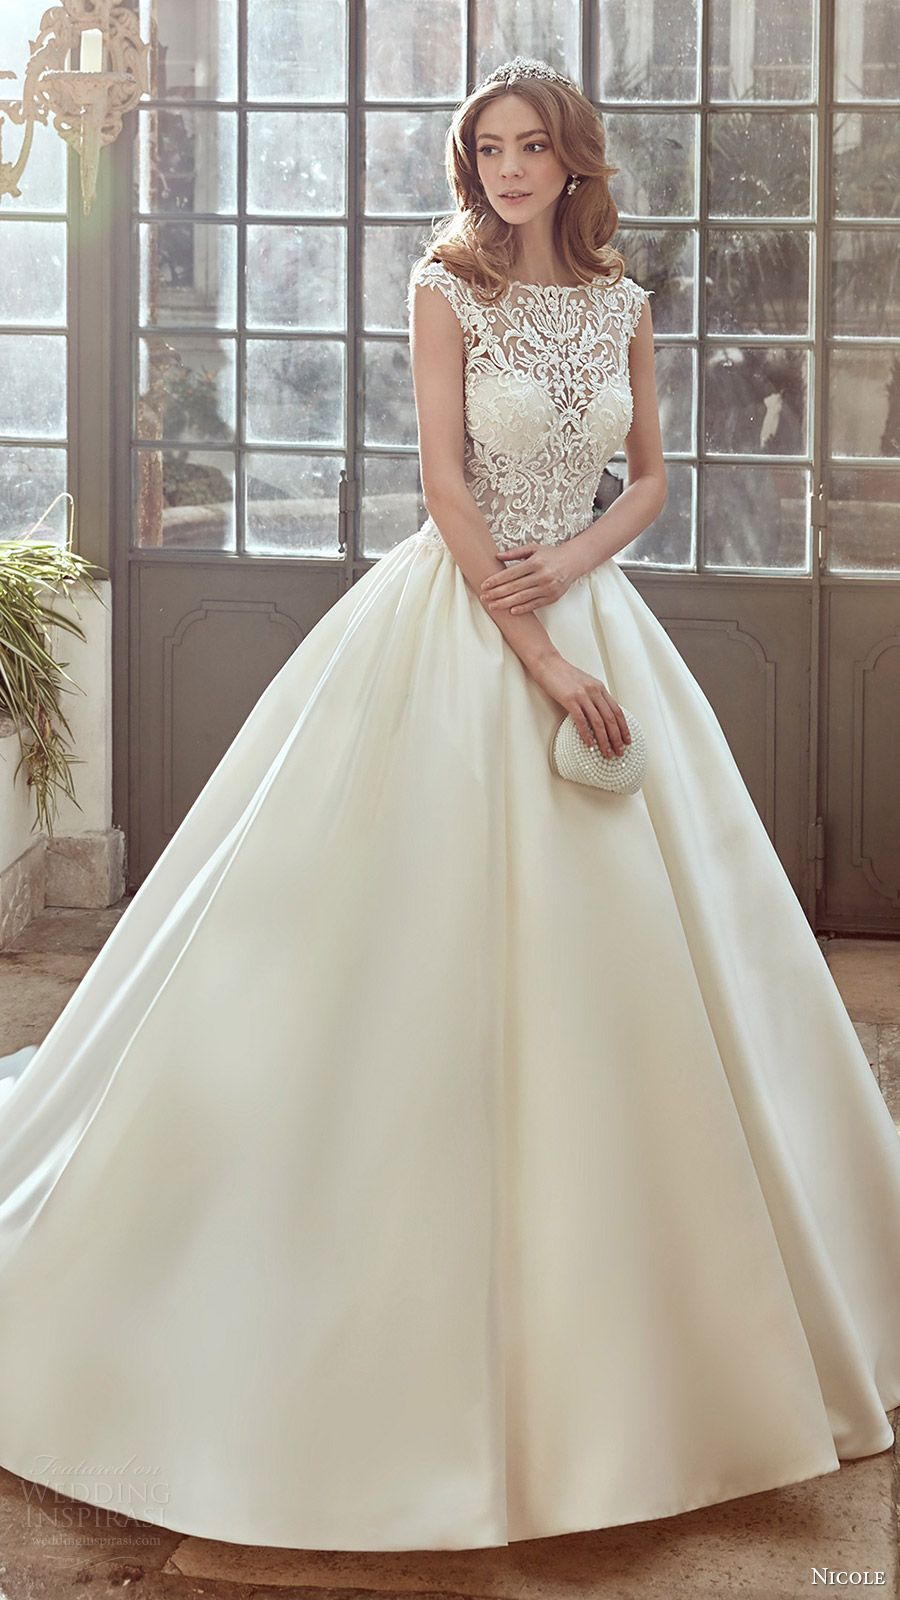 nicole spose bridal 2017 cap sleeve illusion jewel sweetheart ball gown wedding dress (niab17048) mv